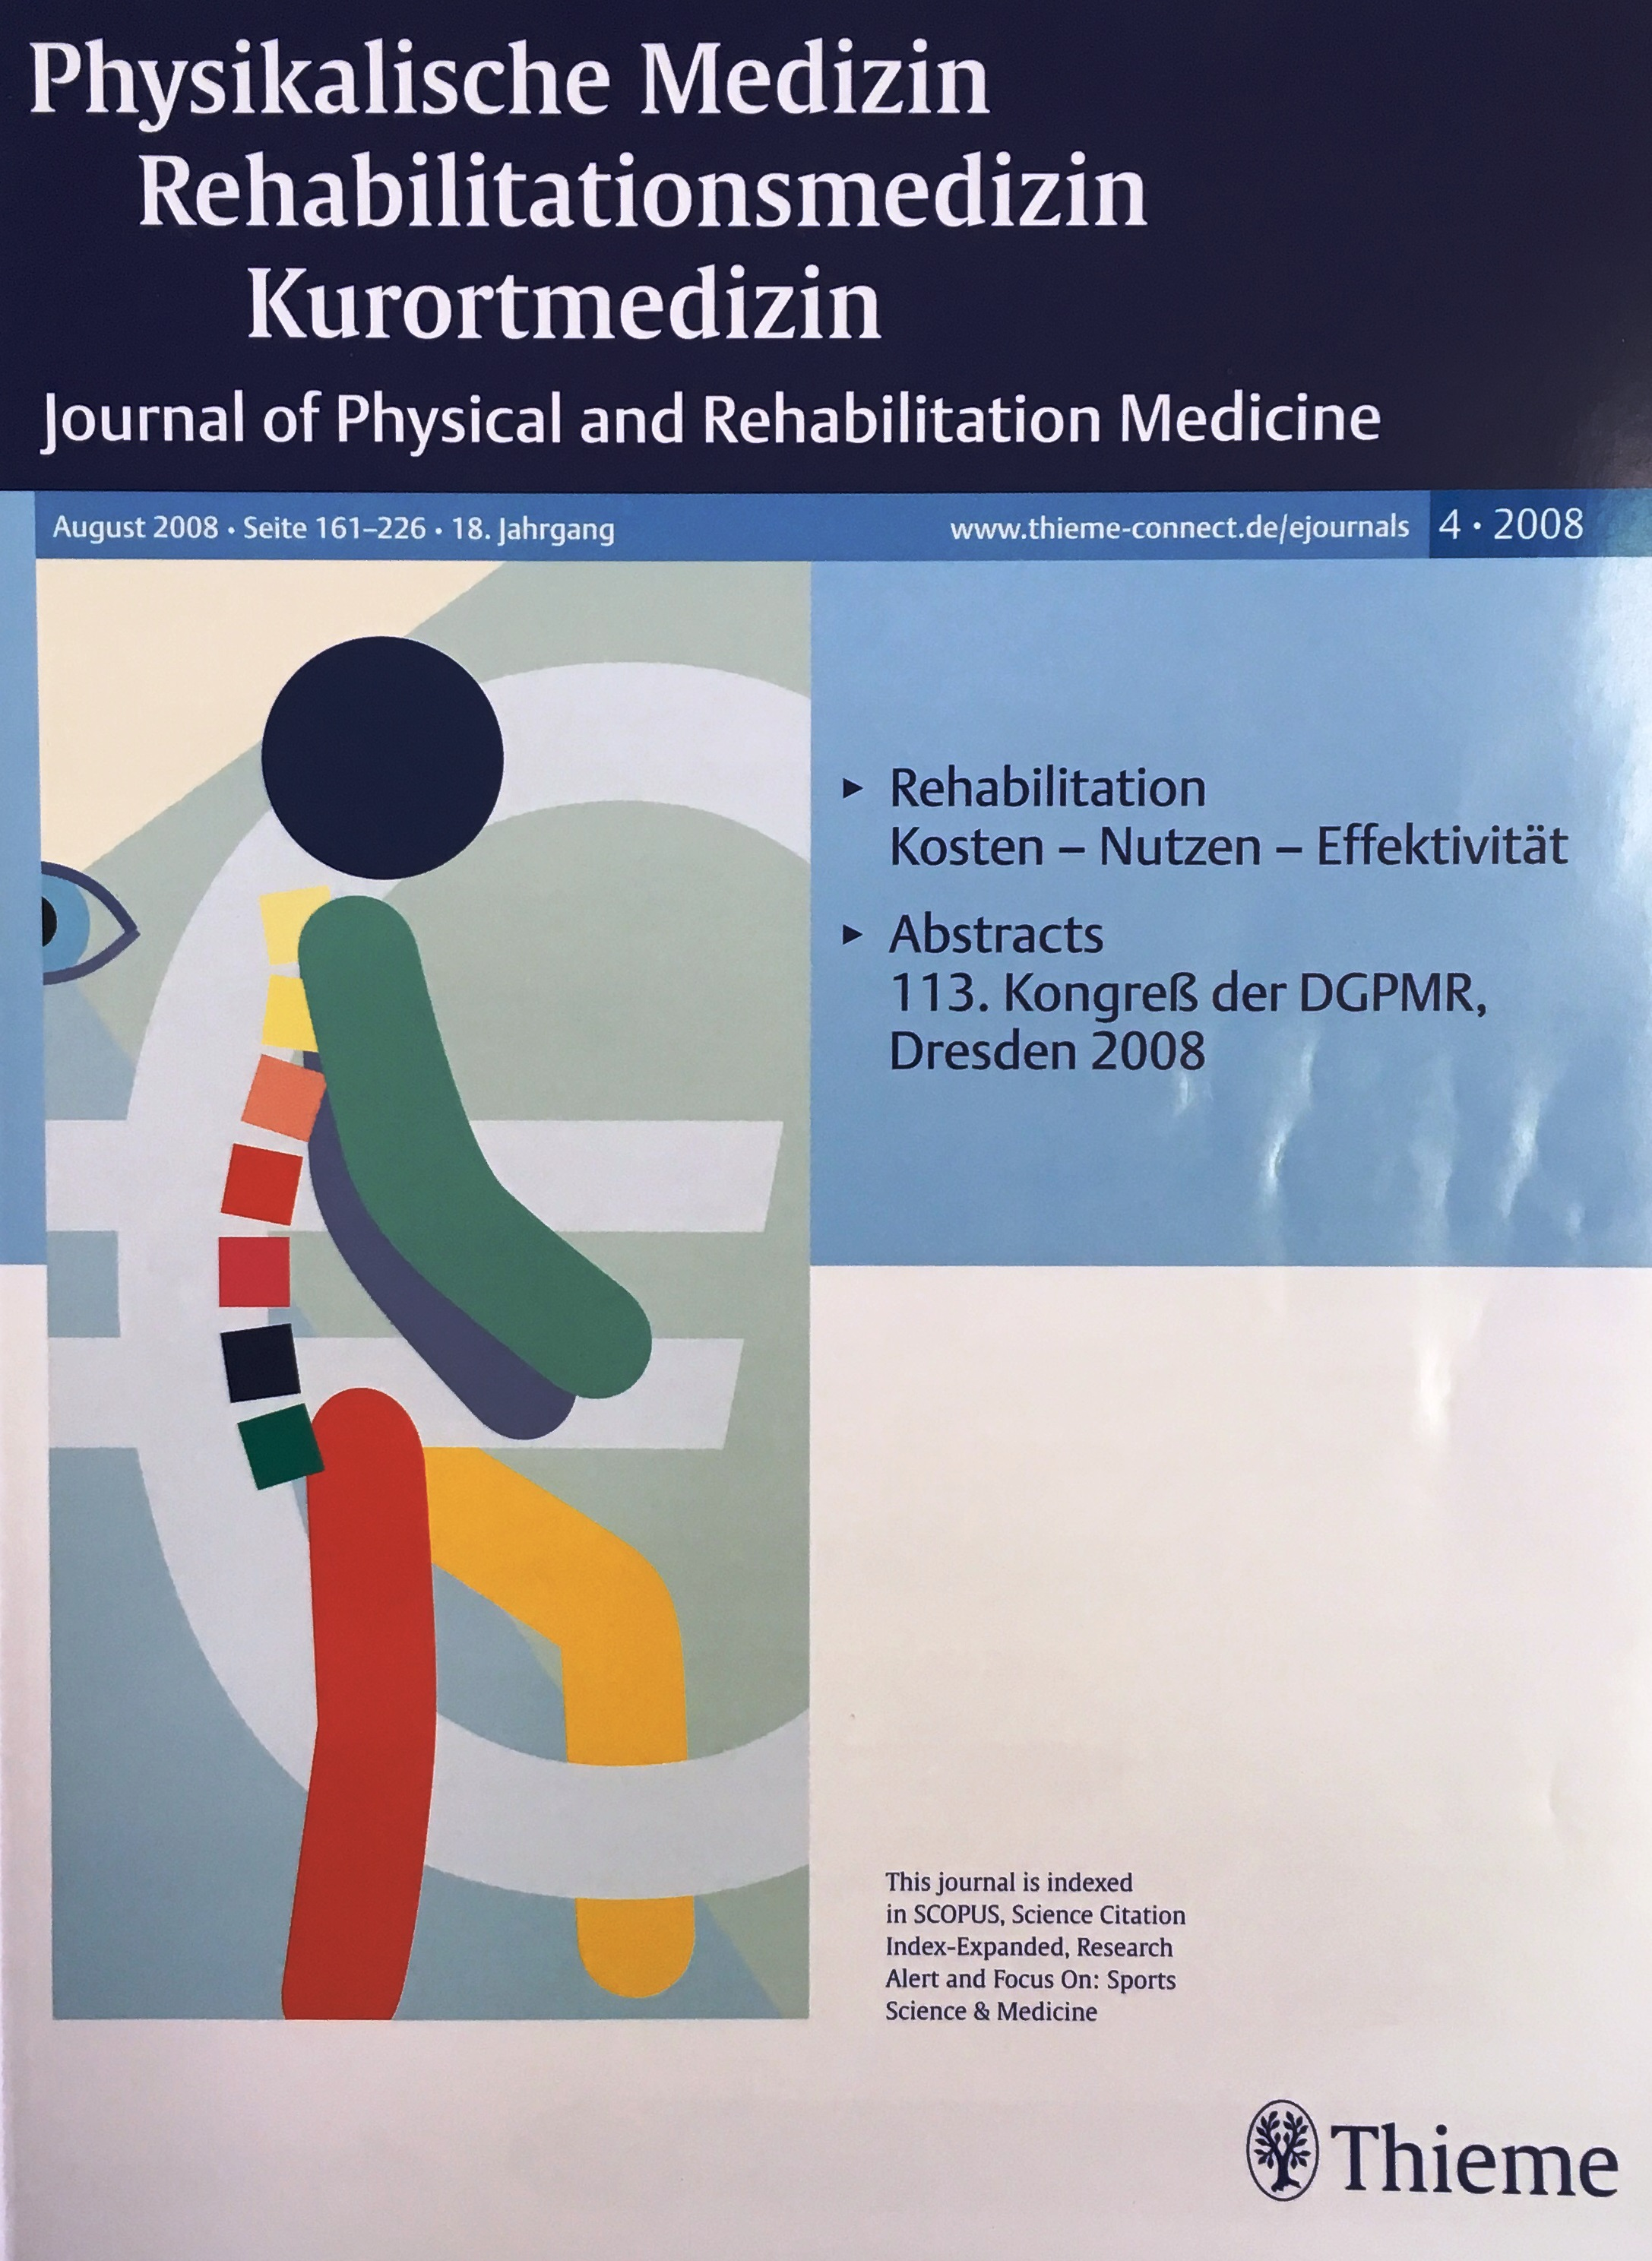 Physikalische Medizin 2008